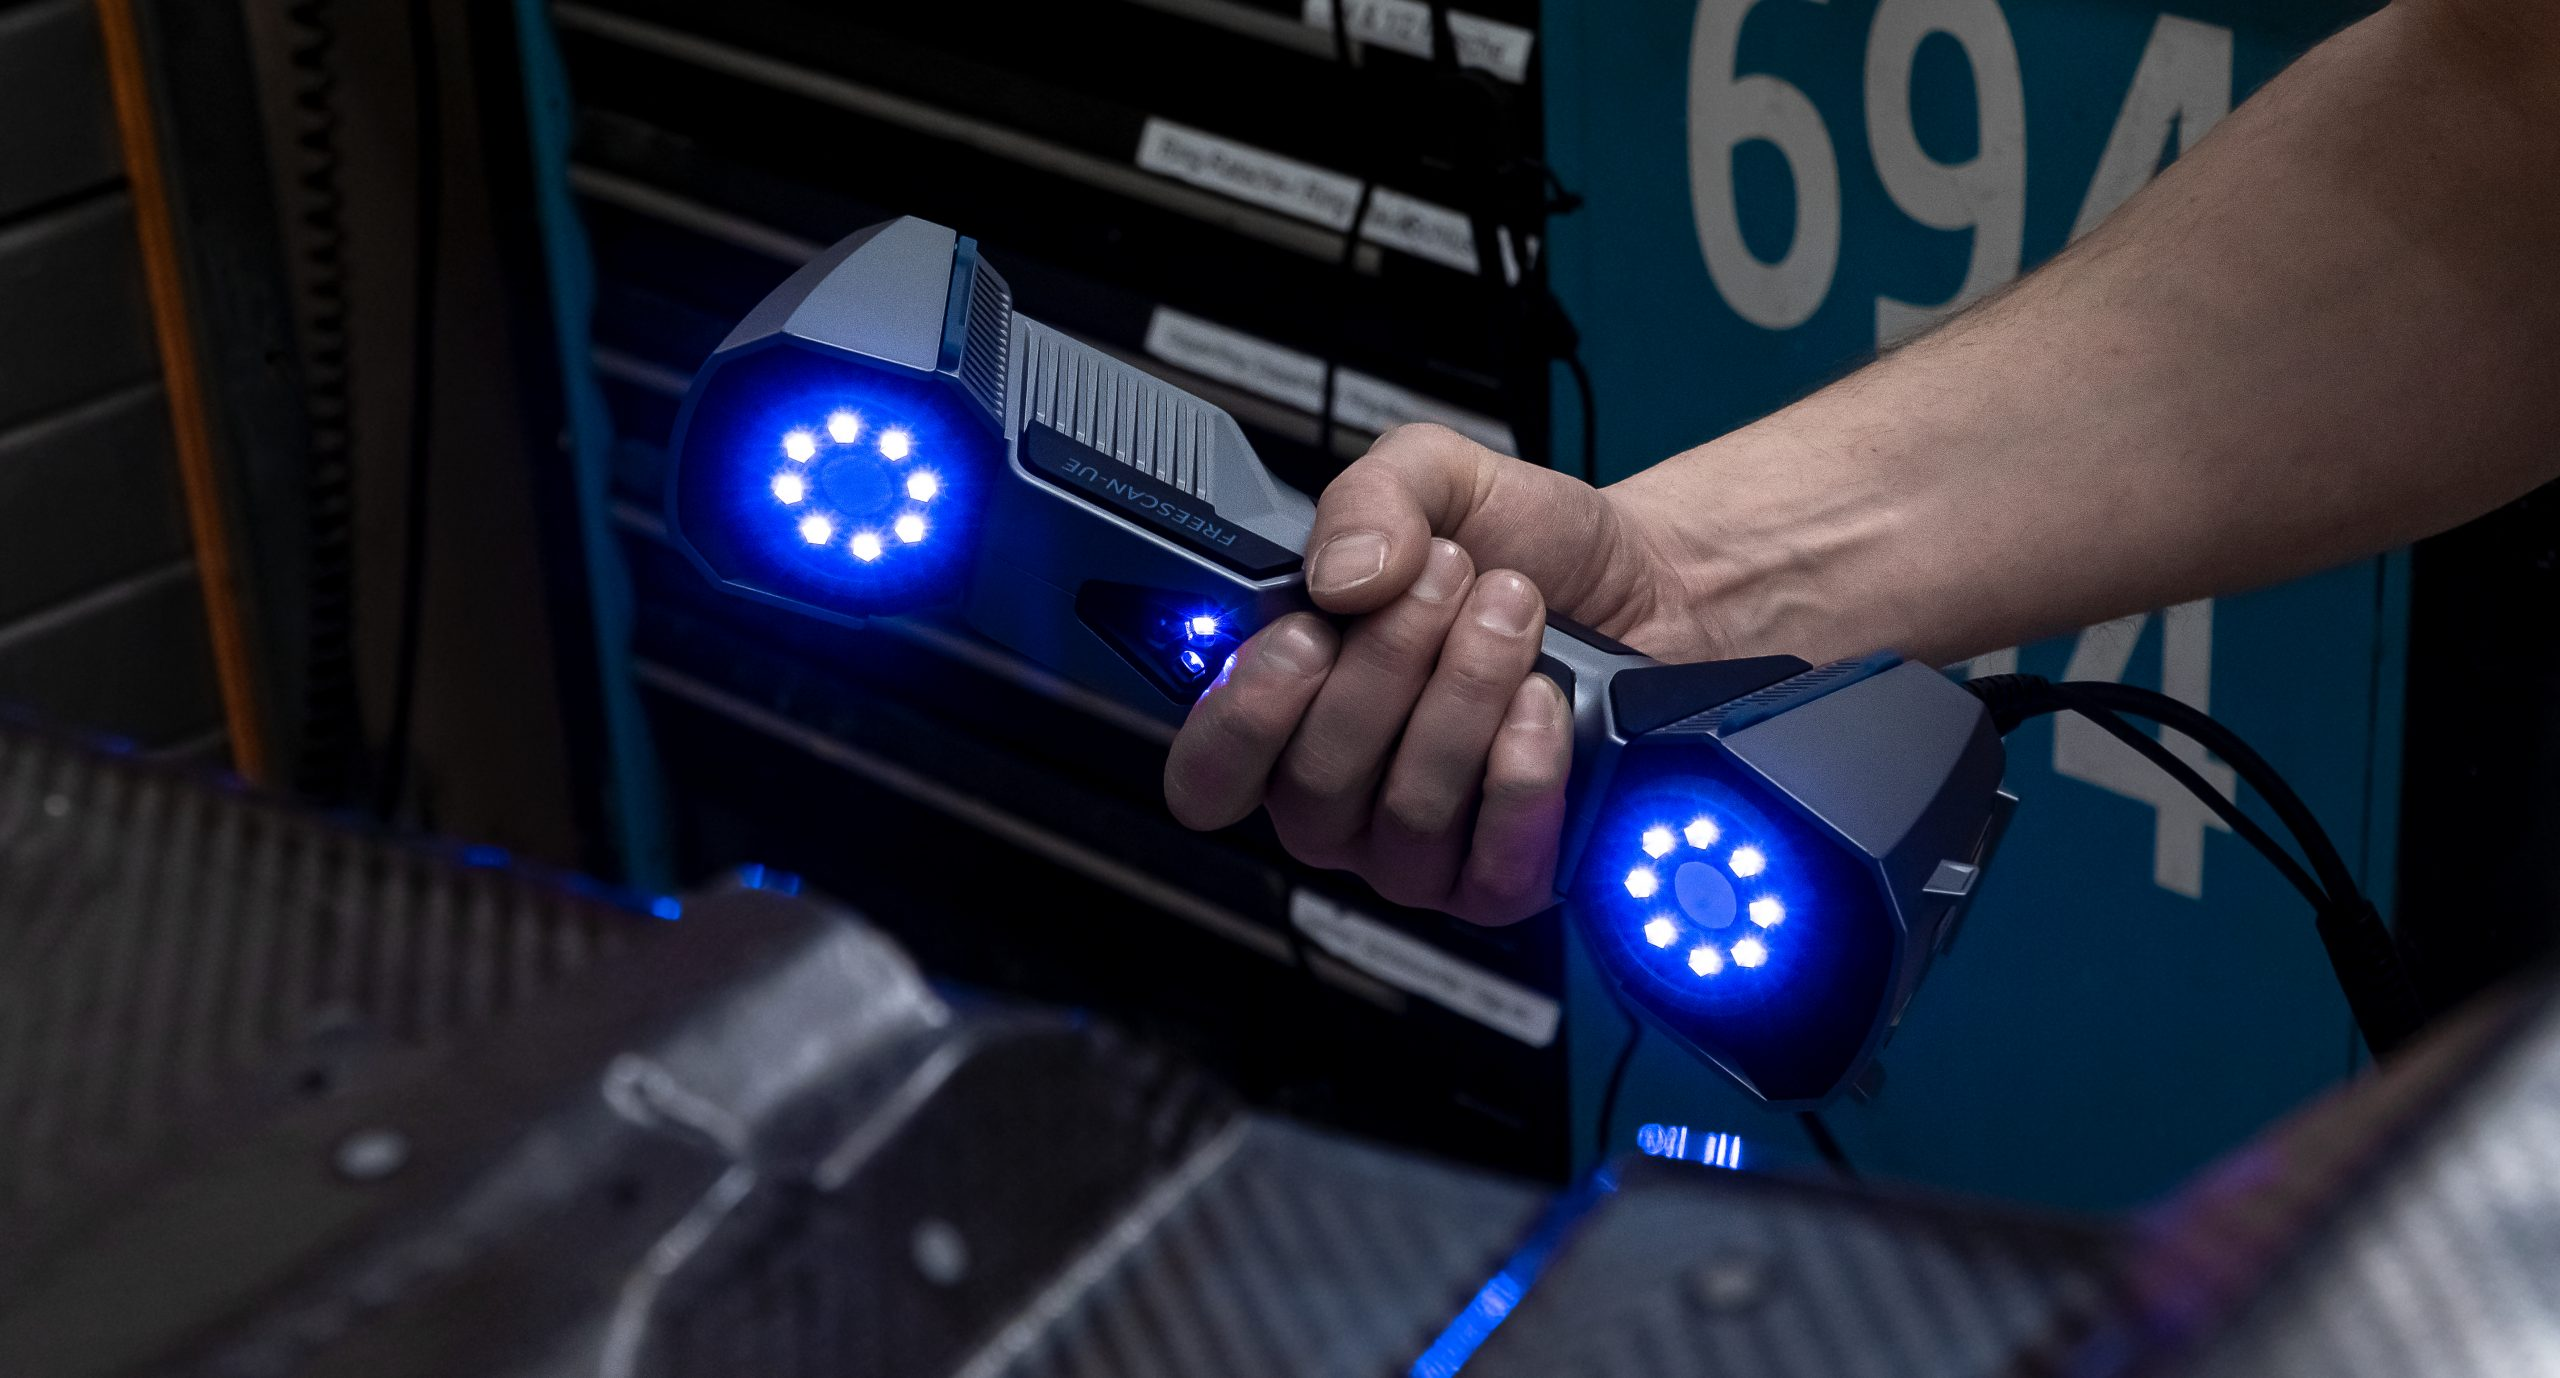 FreeScan UE Shining 3D - 3D scanners